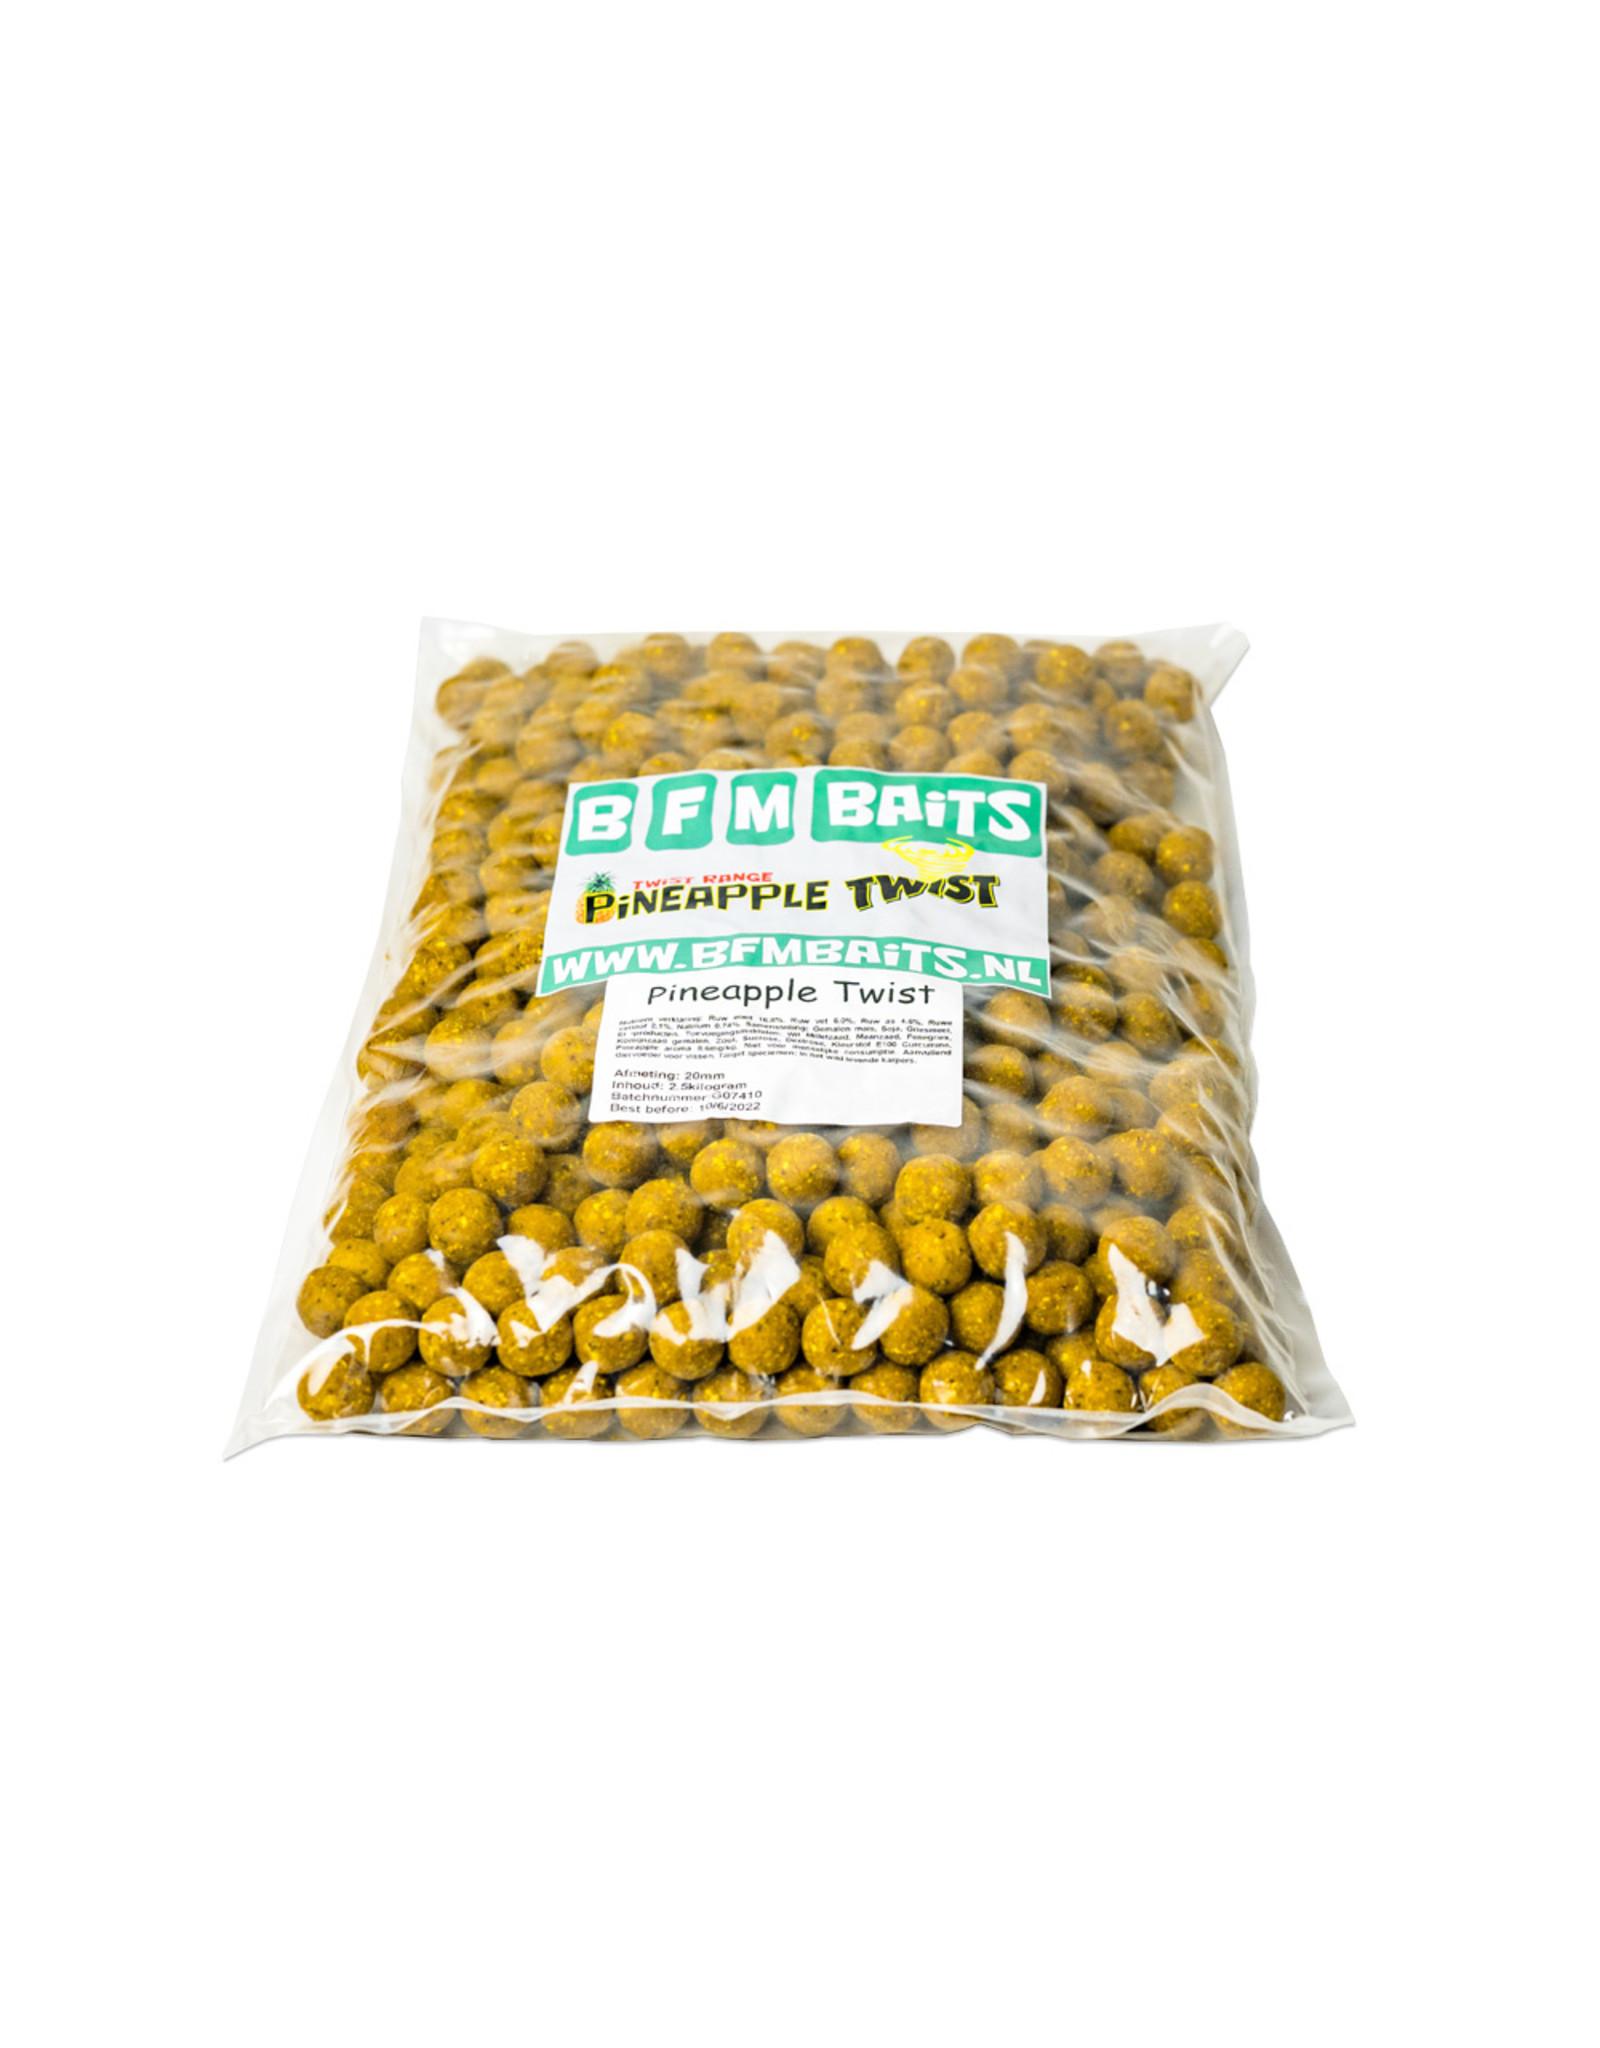 BFM Baits Pineapple Twist - Bulk deal